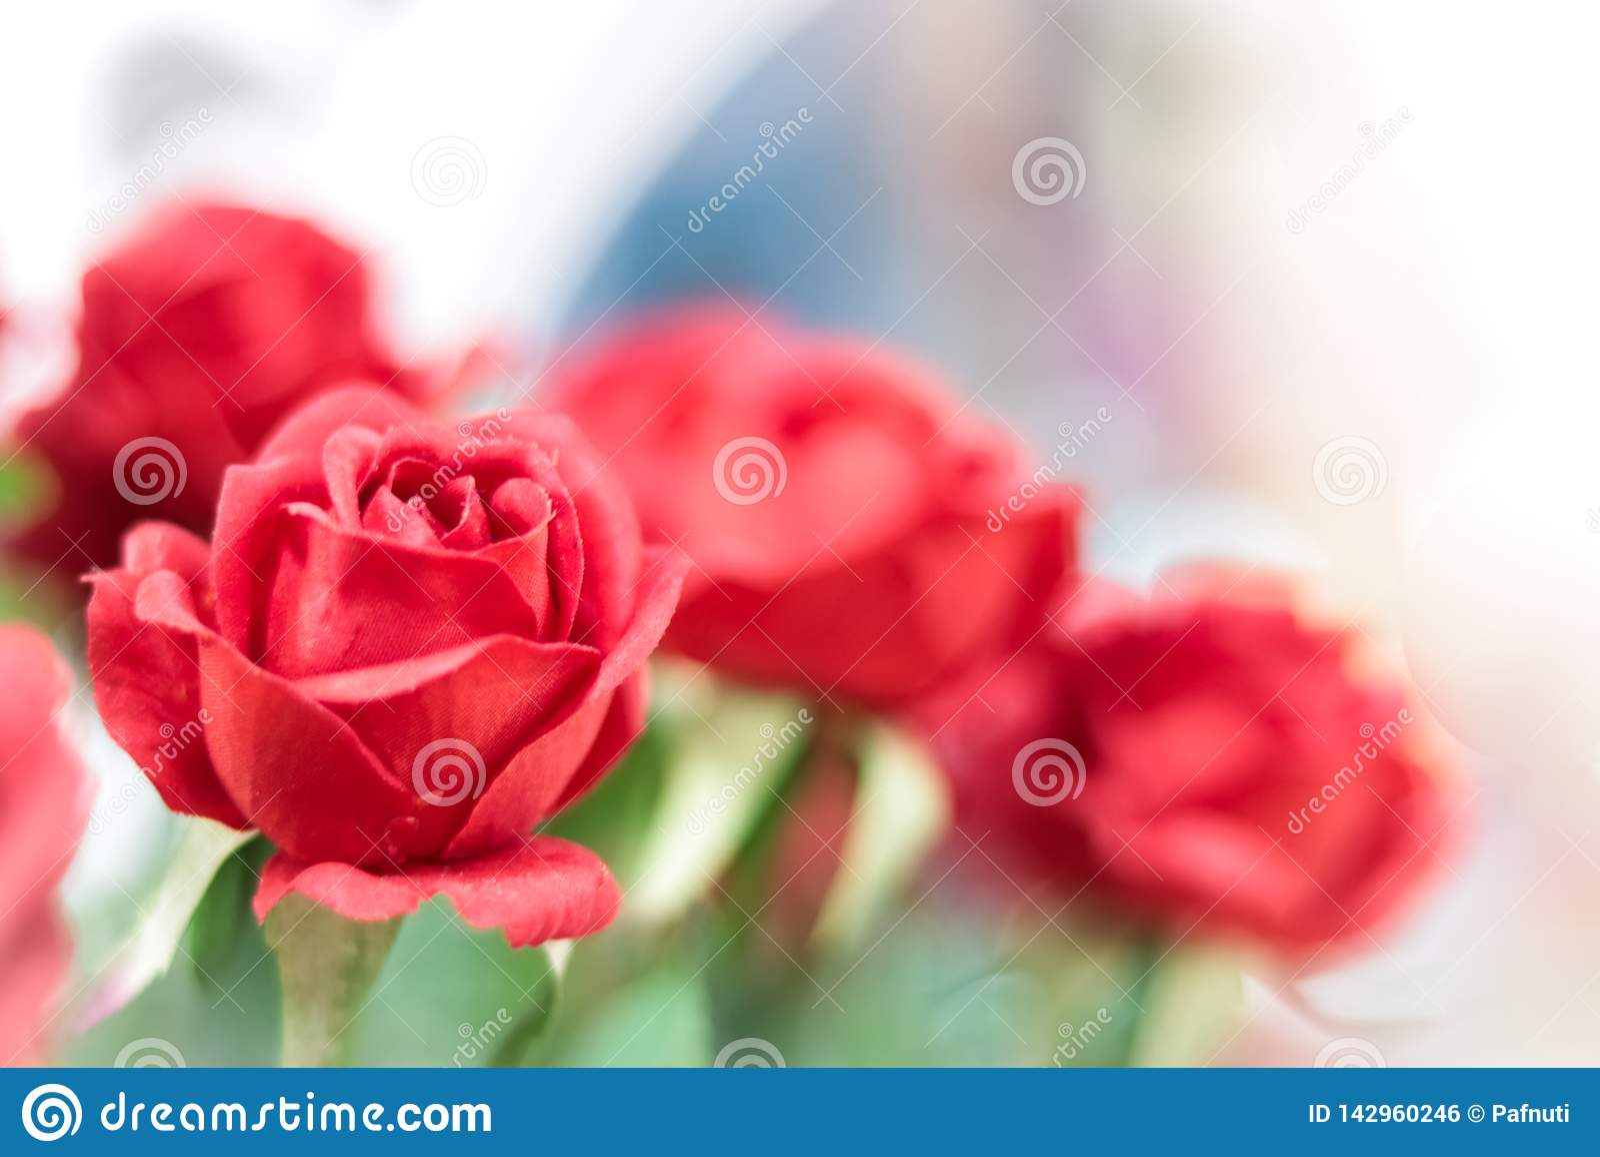 Kunstmatige rode rozen op vage achtergrond